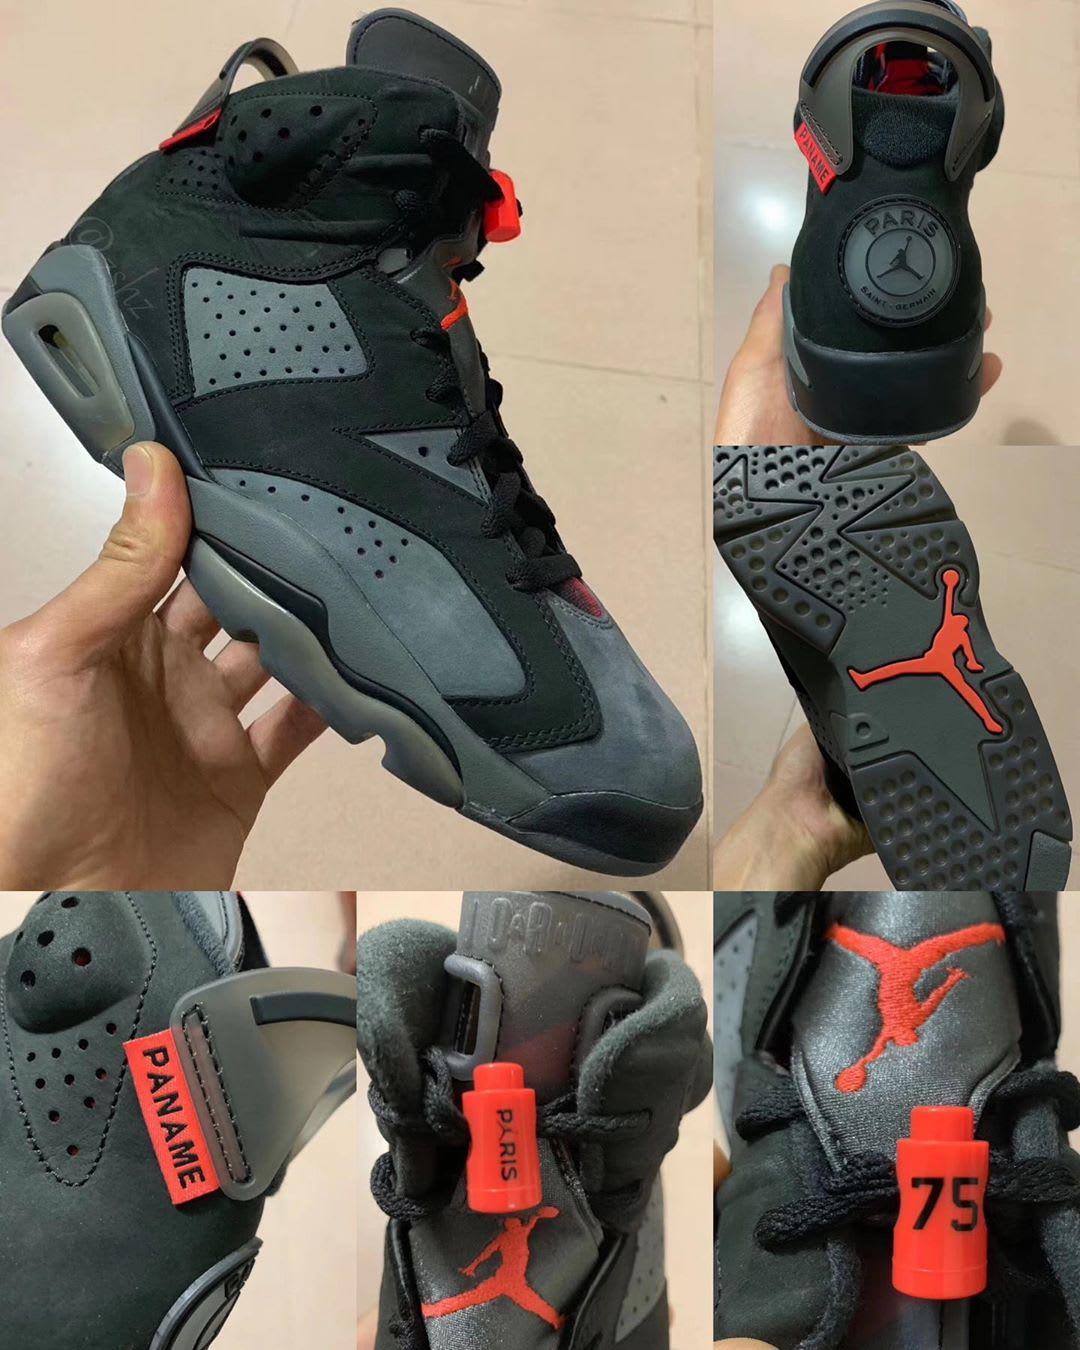 First Look at the 'PSG' Air Jordan 6